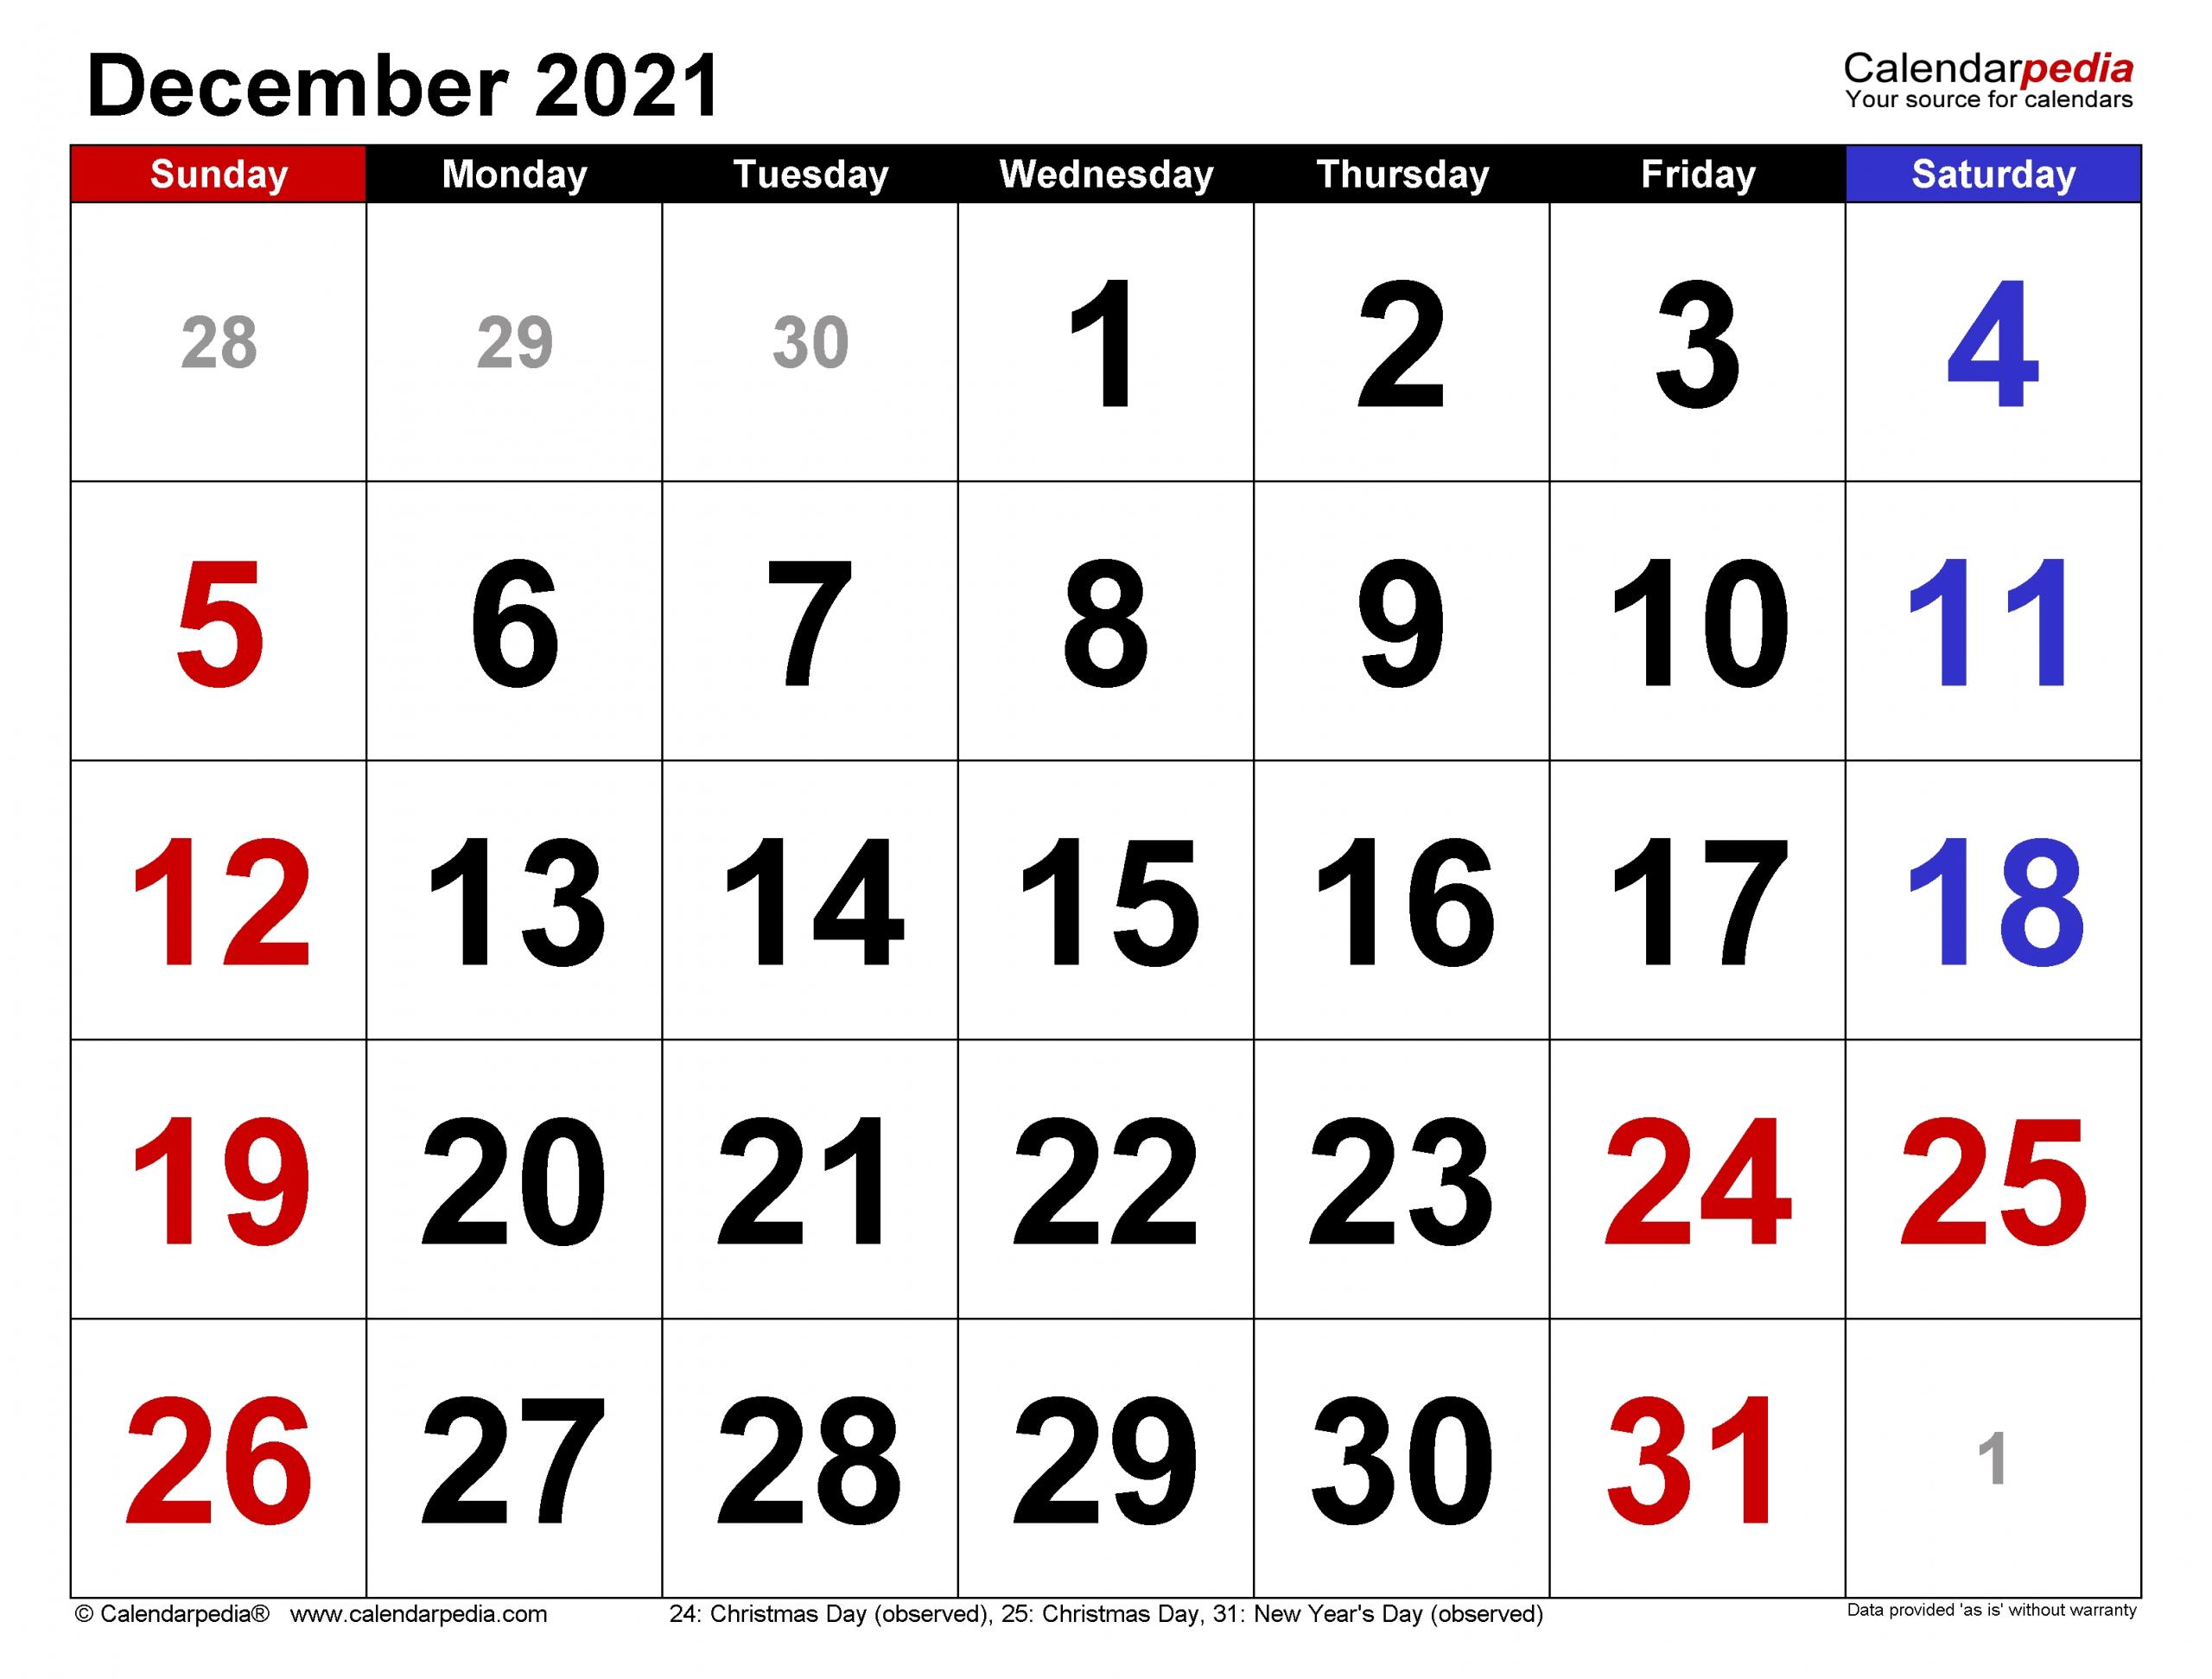 Take Weekend Calendar December 2021